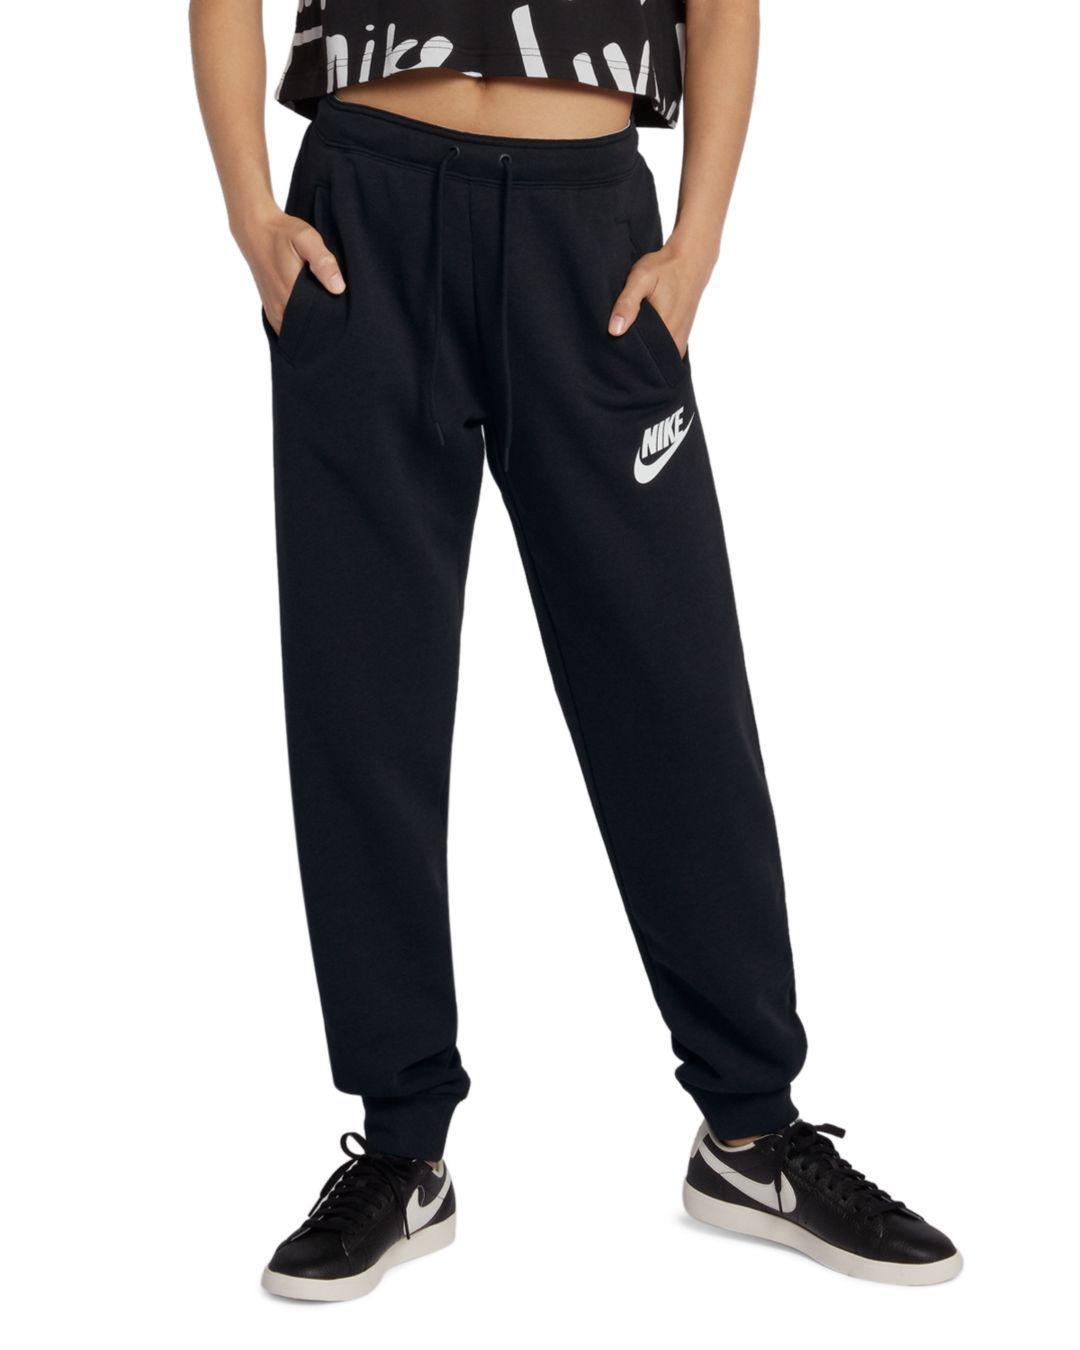 9fa8566110b0 Lyst - Nike Rally Jogger Pants in Black